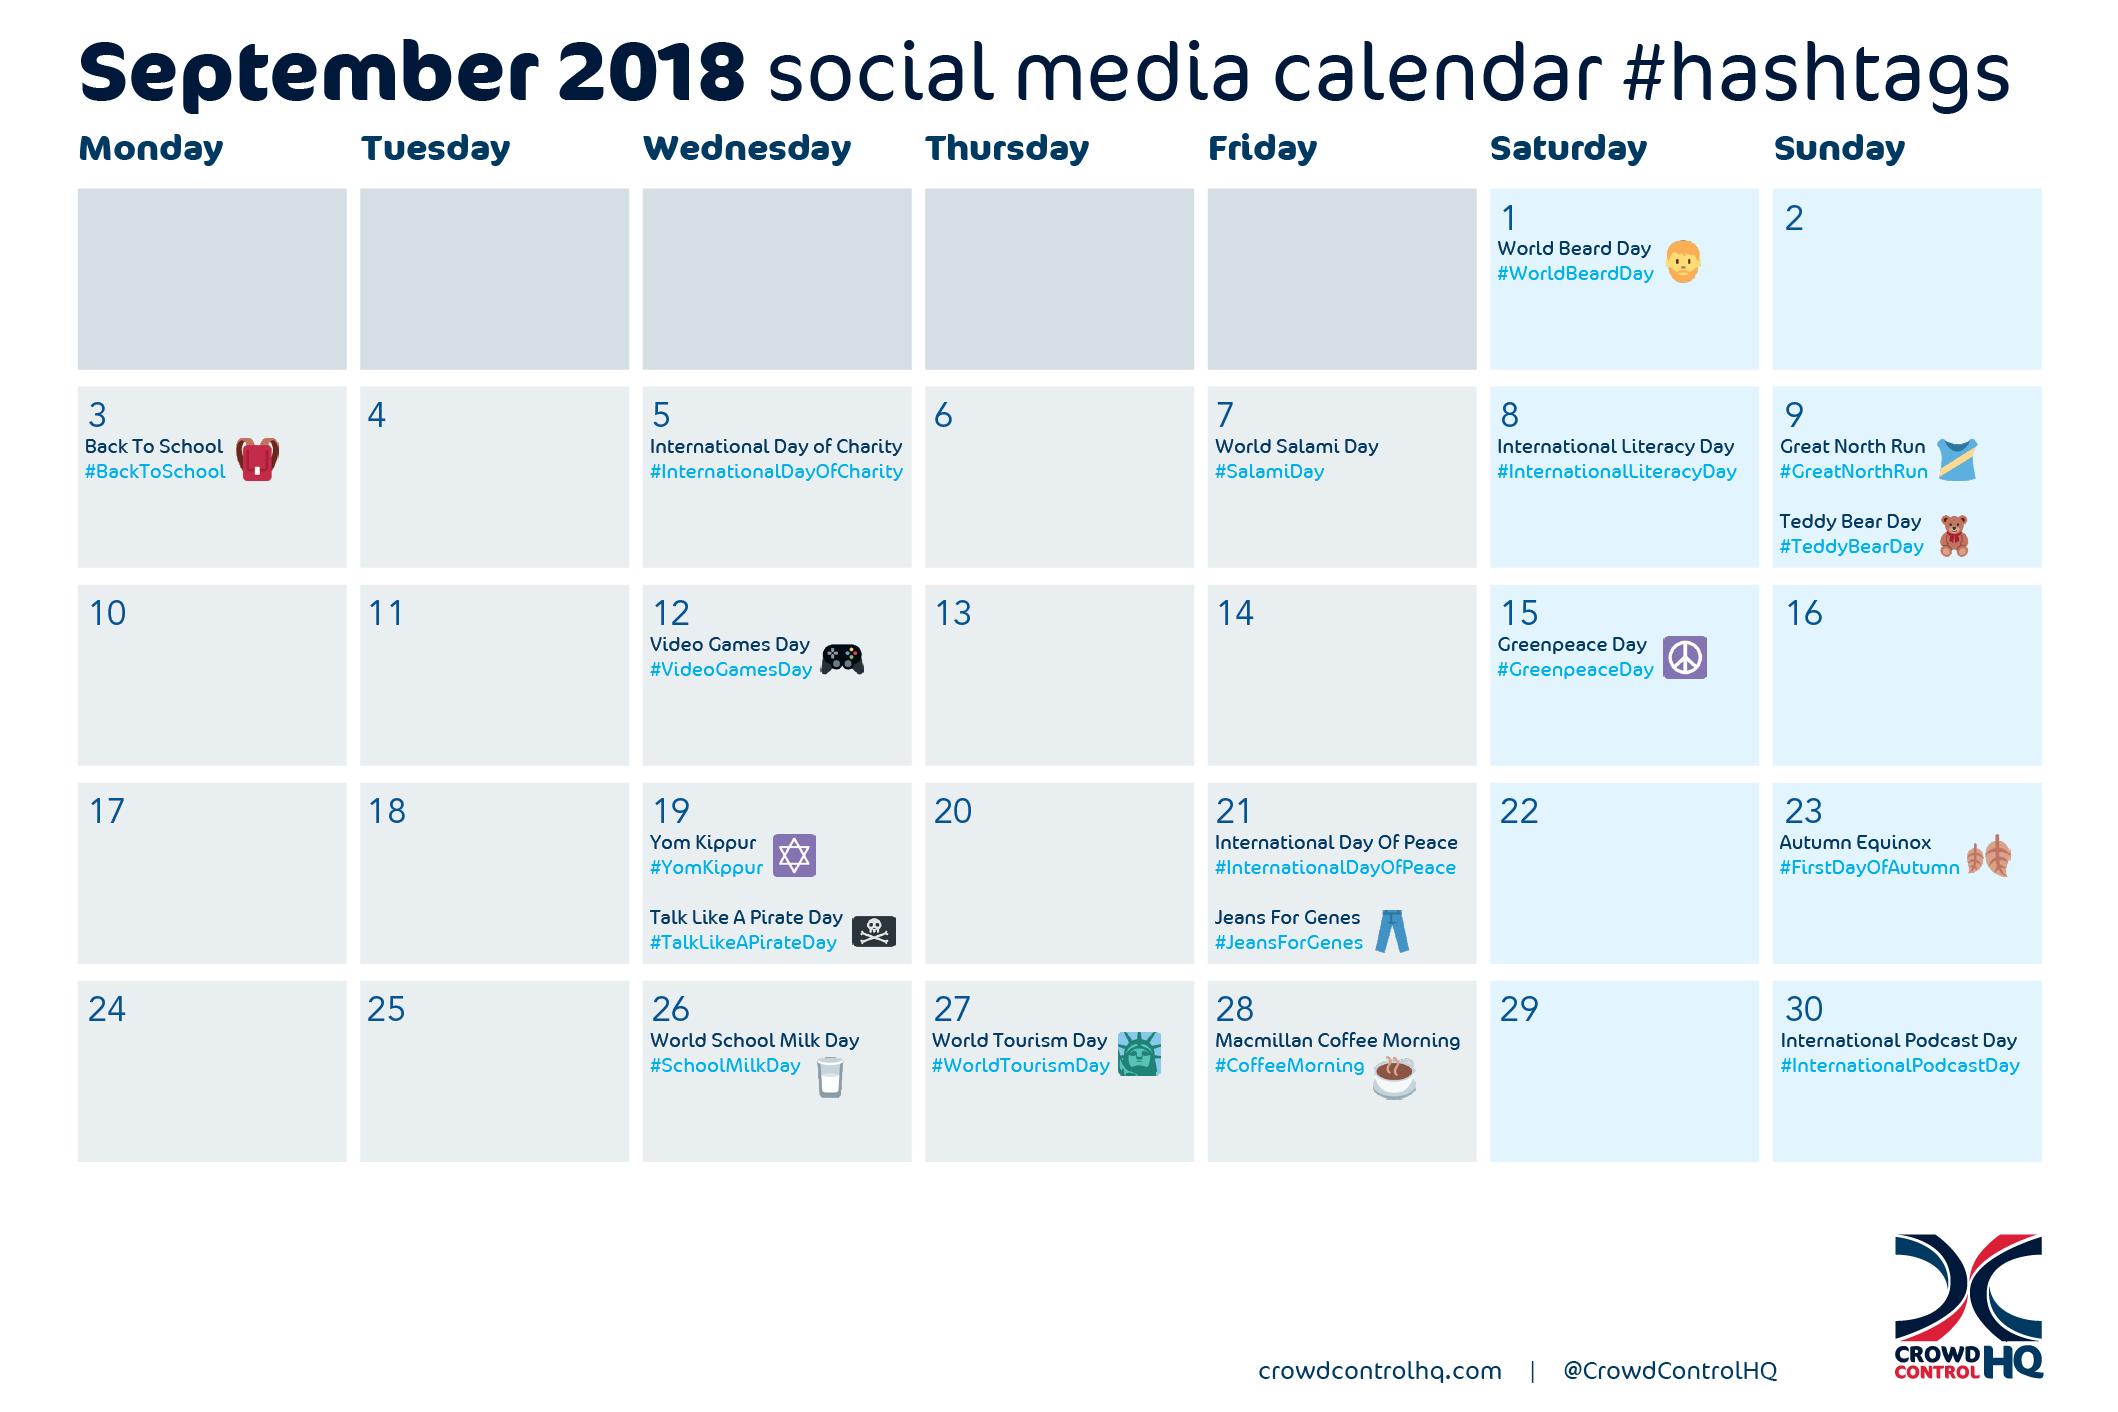 September 2018 social media calendar